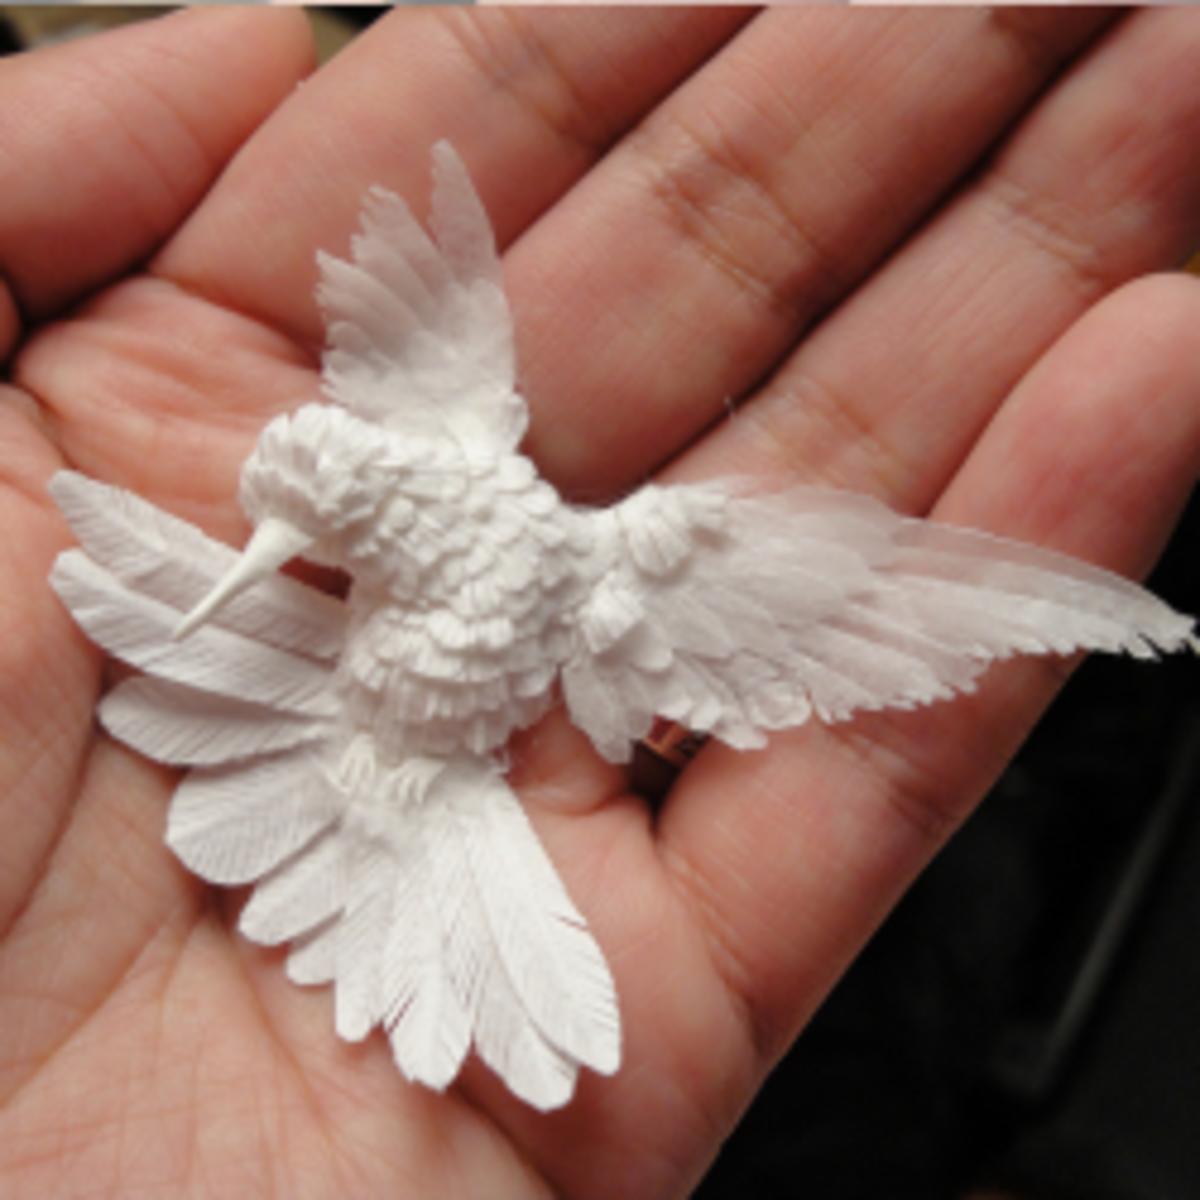 Paper Sculpture Techniques & Inspiration | Video Tutorials for ...